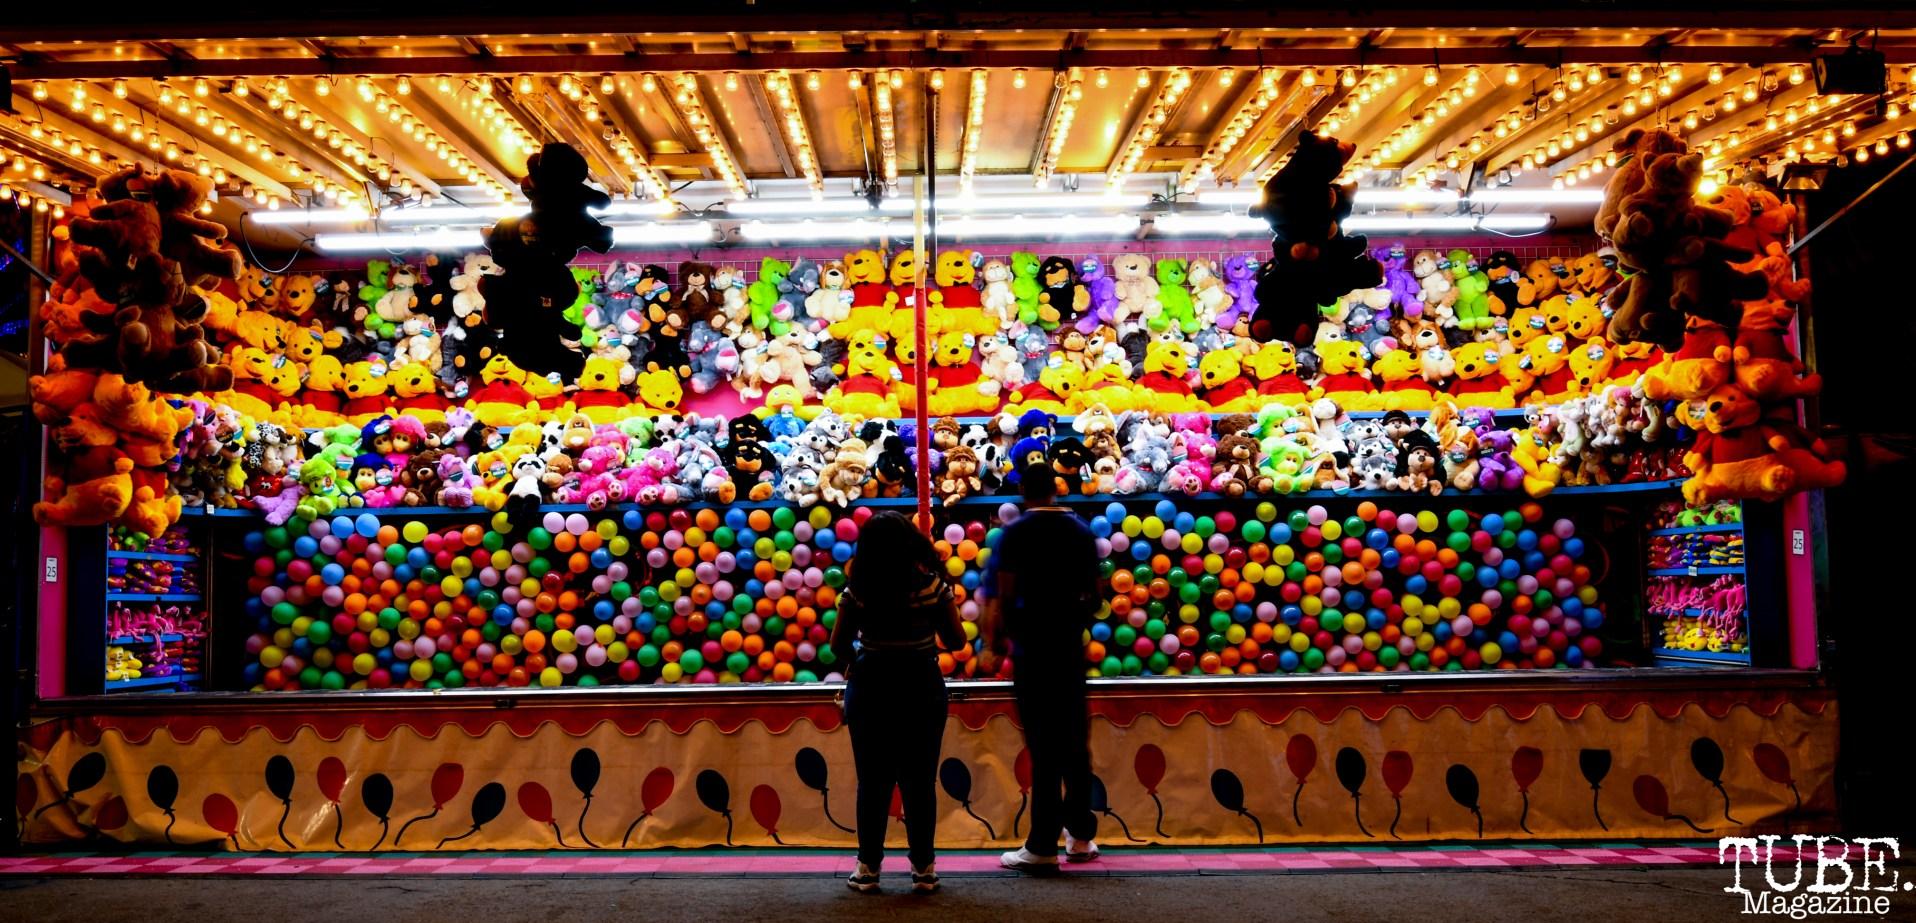 Darts, California State Fair, Cal Expo, Sacramento, CA, July 13, 2018 Photo by Daniel Tyree